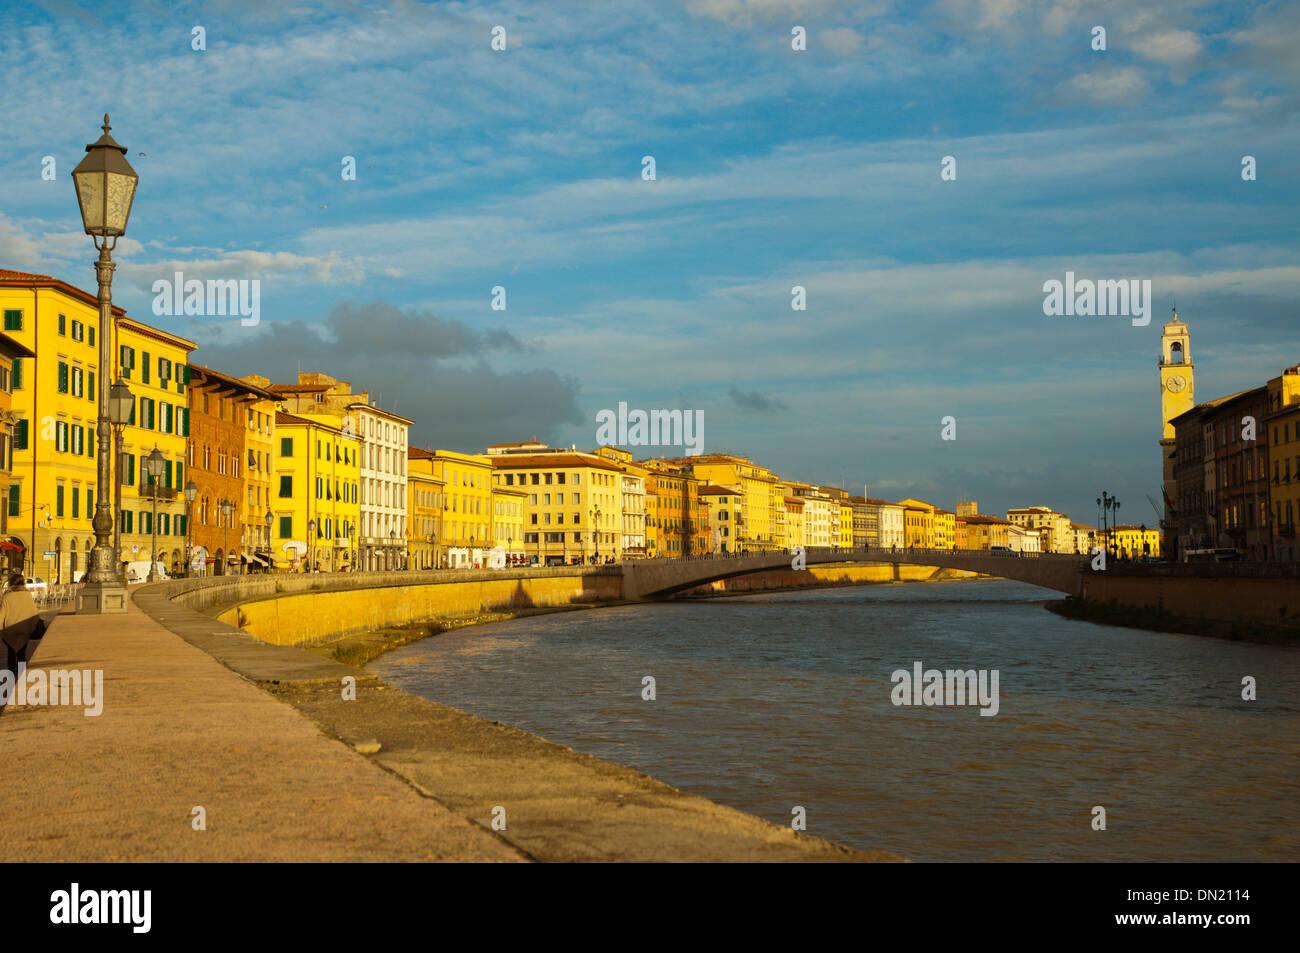 Lungarno Antonio Pacinotti riverside street central Pisa city Tuscany region Italy Europe Stock Photo